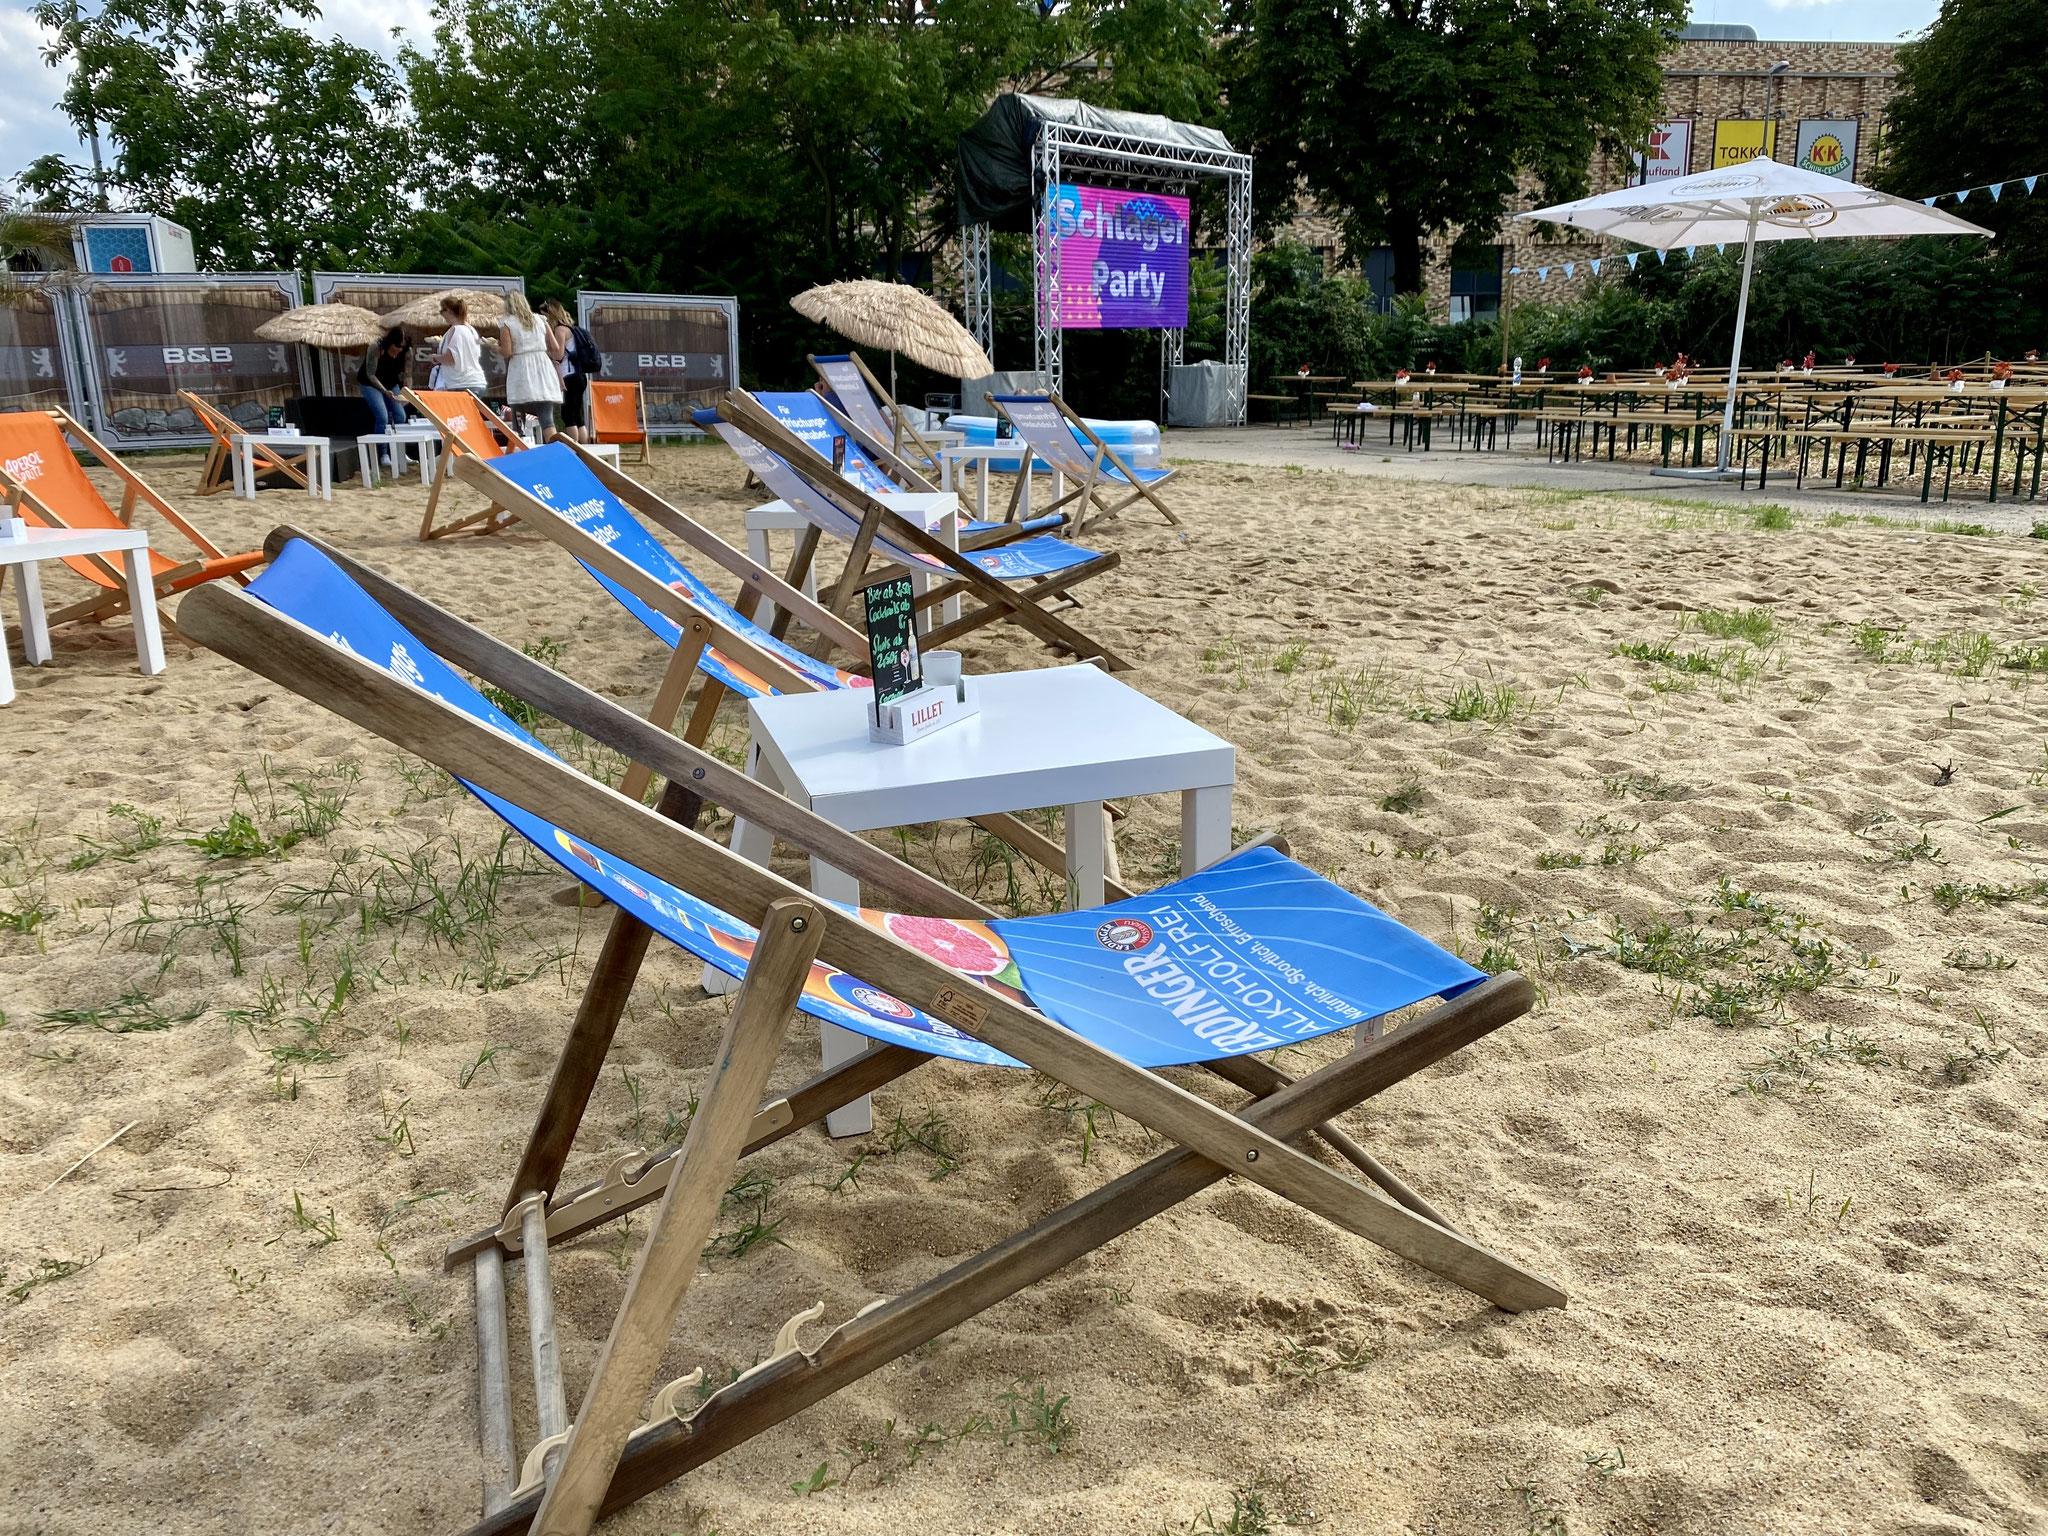 Sa+So, 17.+18.07. | 16.00-22.00 Uhr: Beach Bar Biesdorf – Musik, Strand, Snacks und kühle Getränke